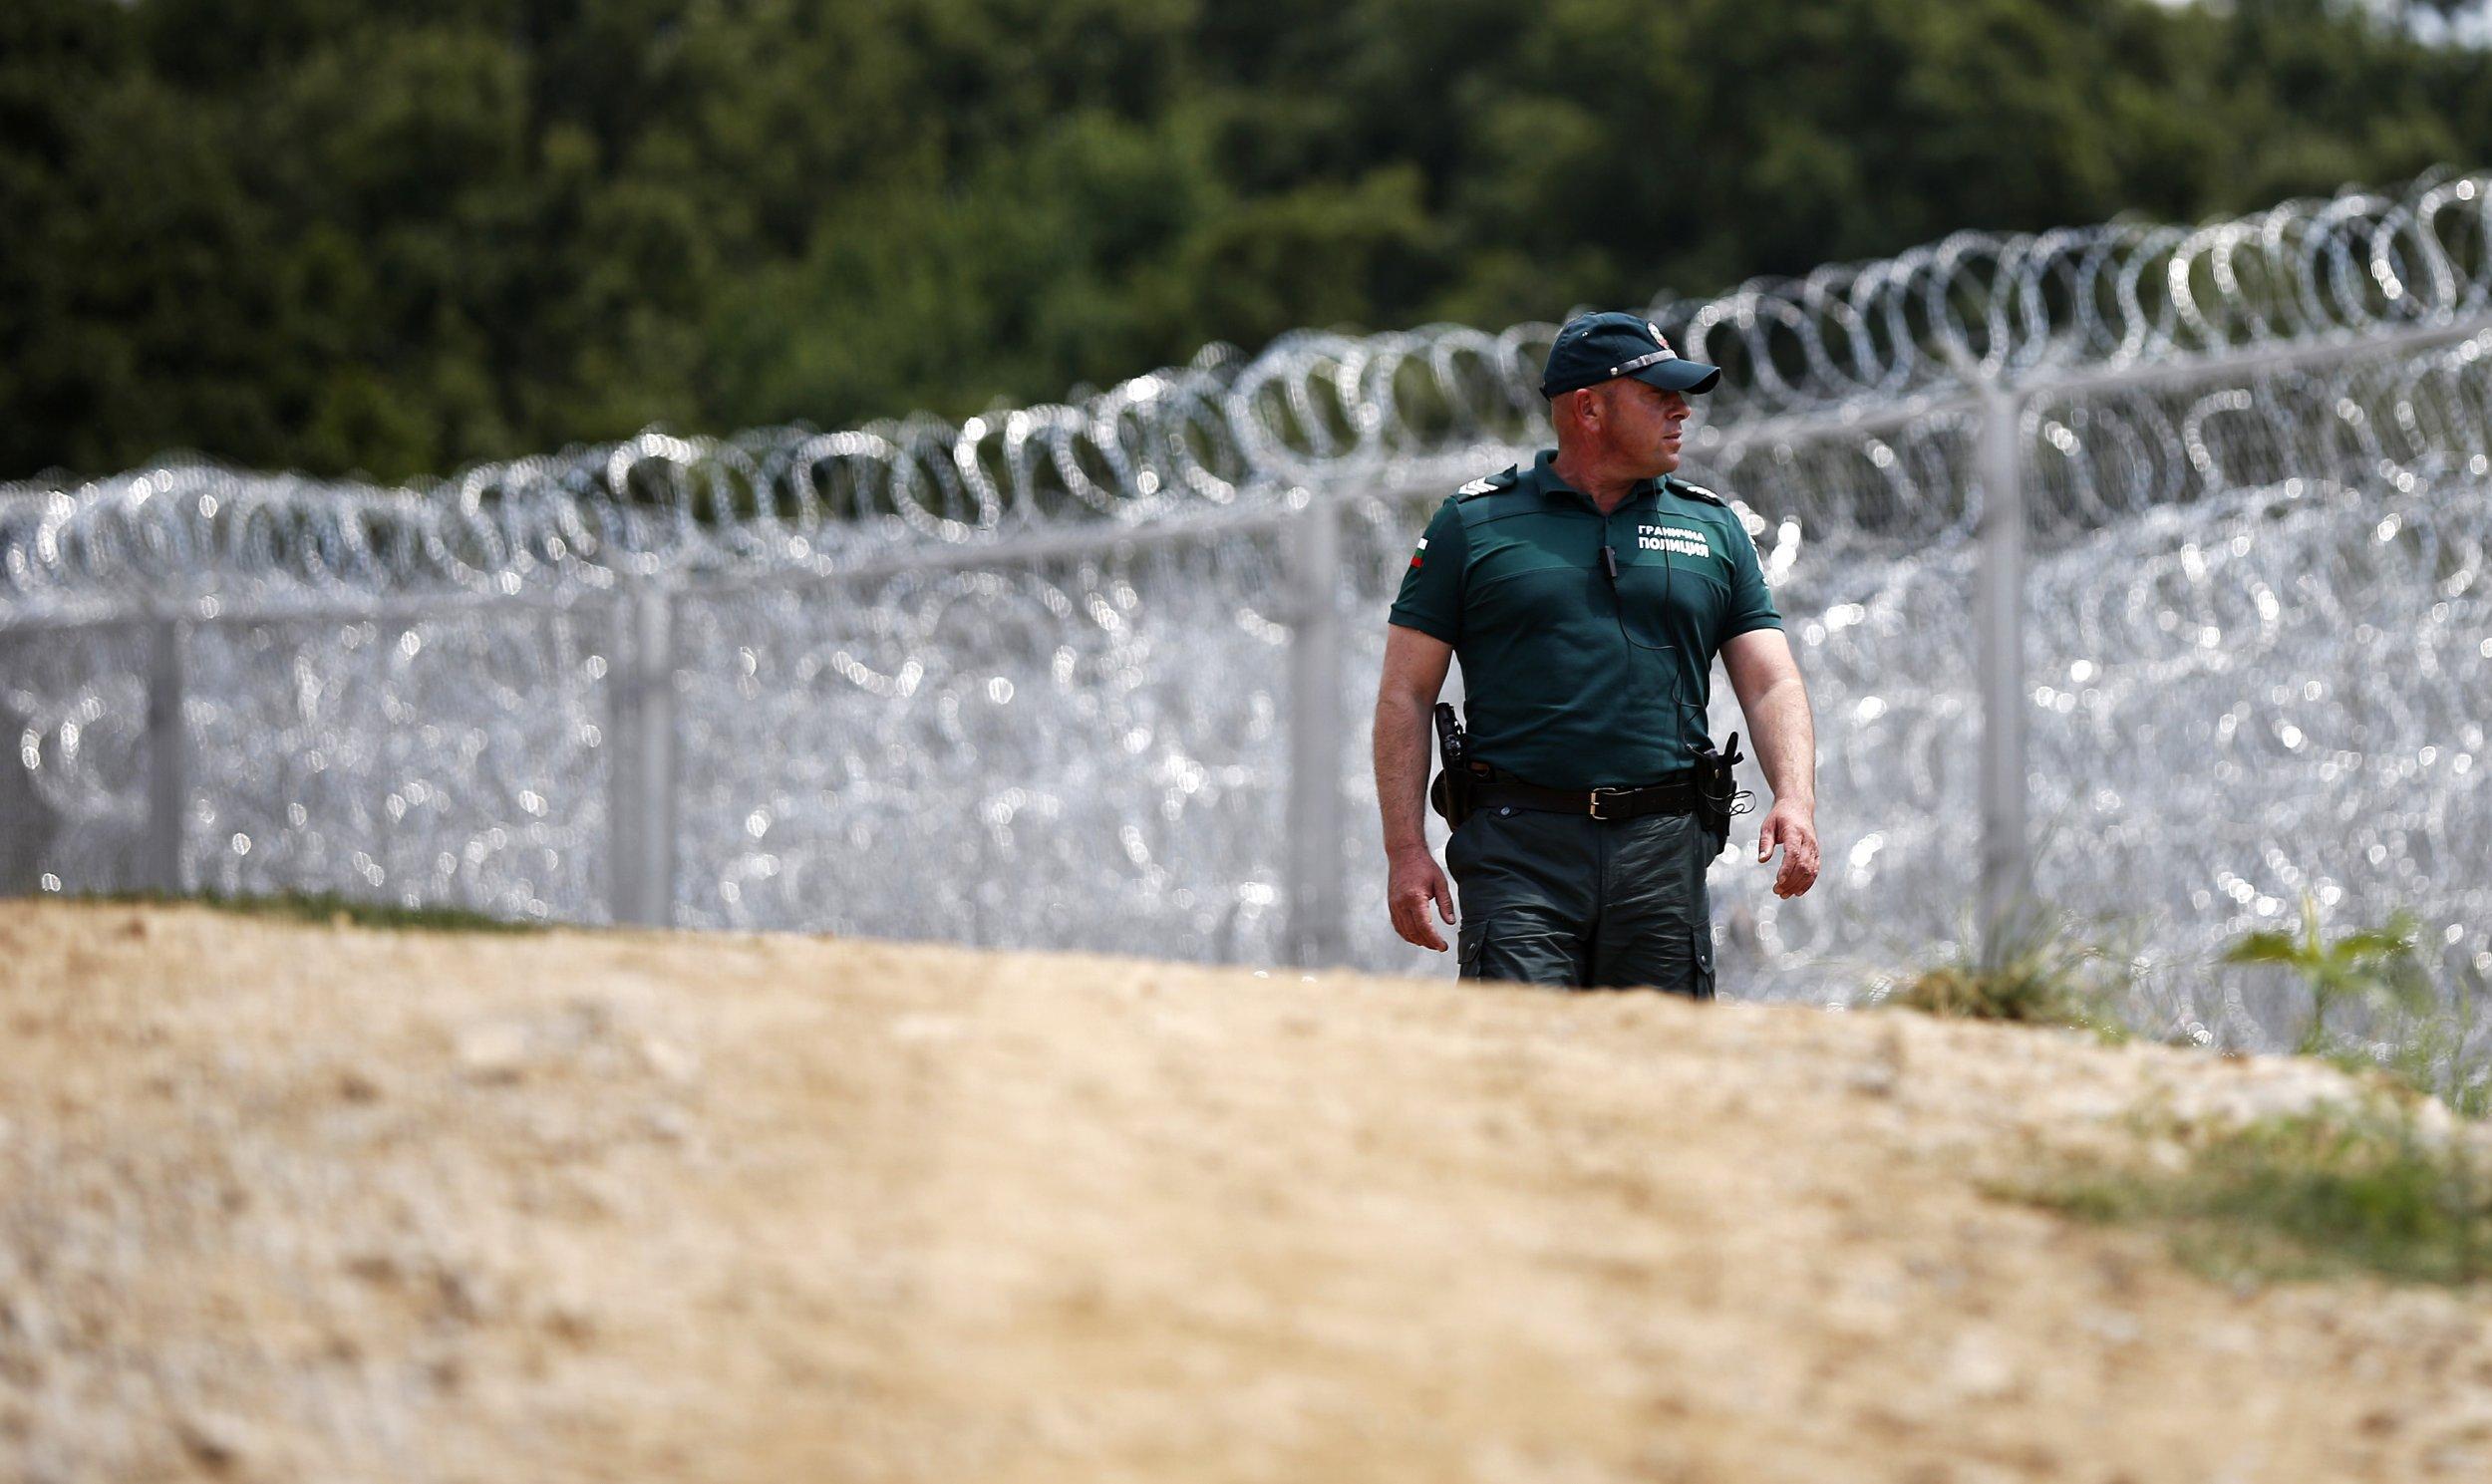 Bulgarian border police